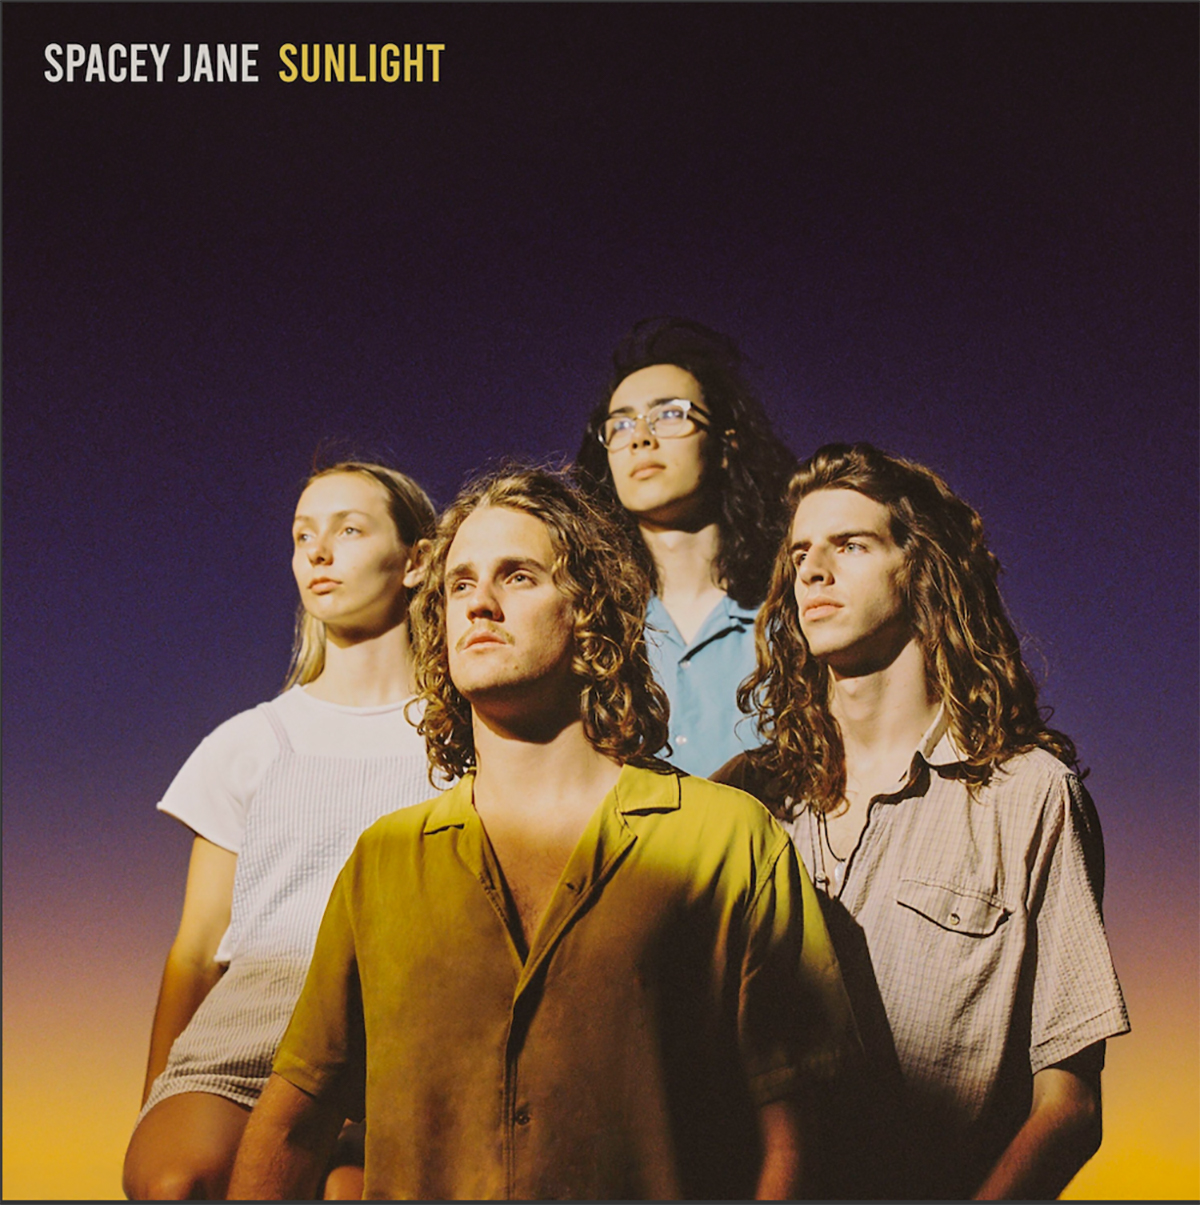 Spacey Jane Sunlight